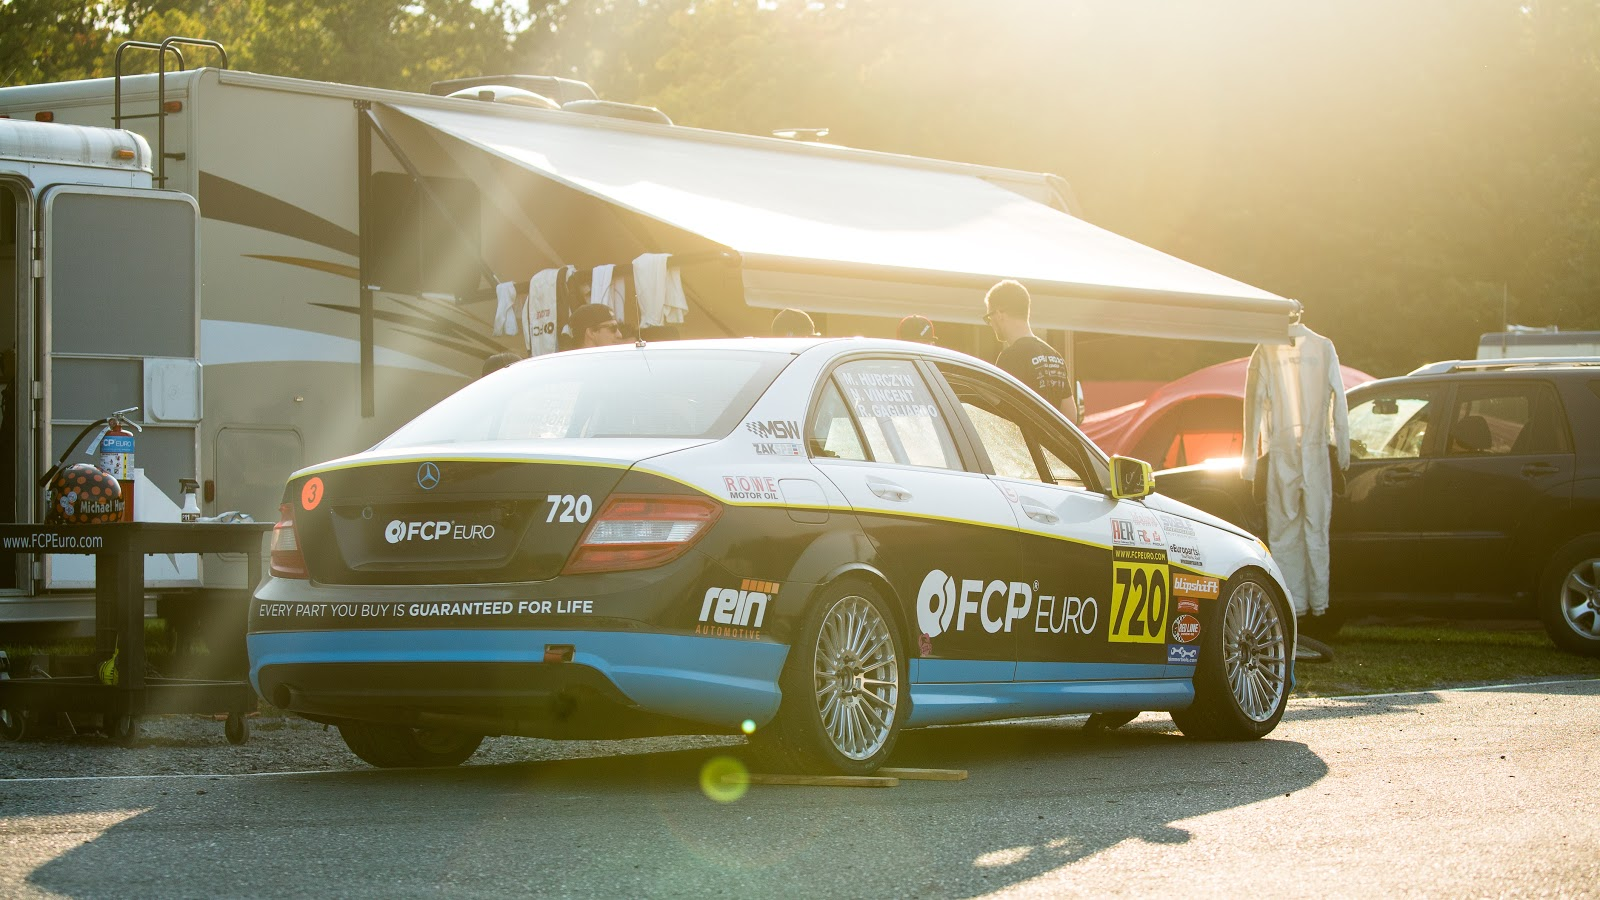 Mercedes C300 Race Car